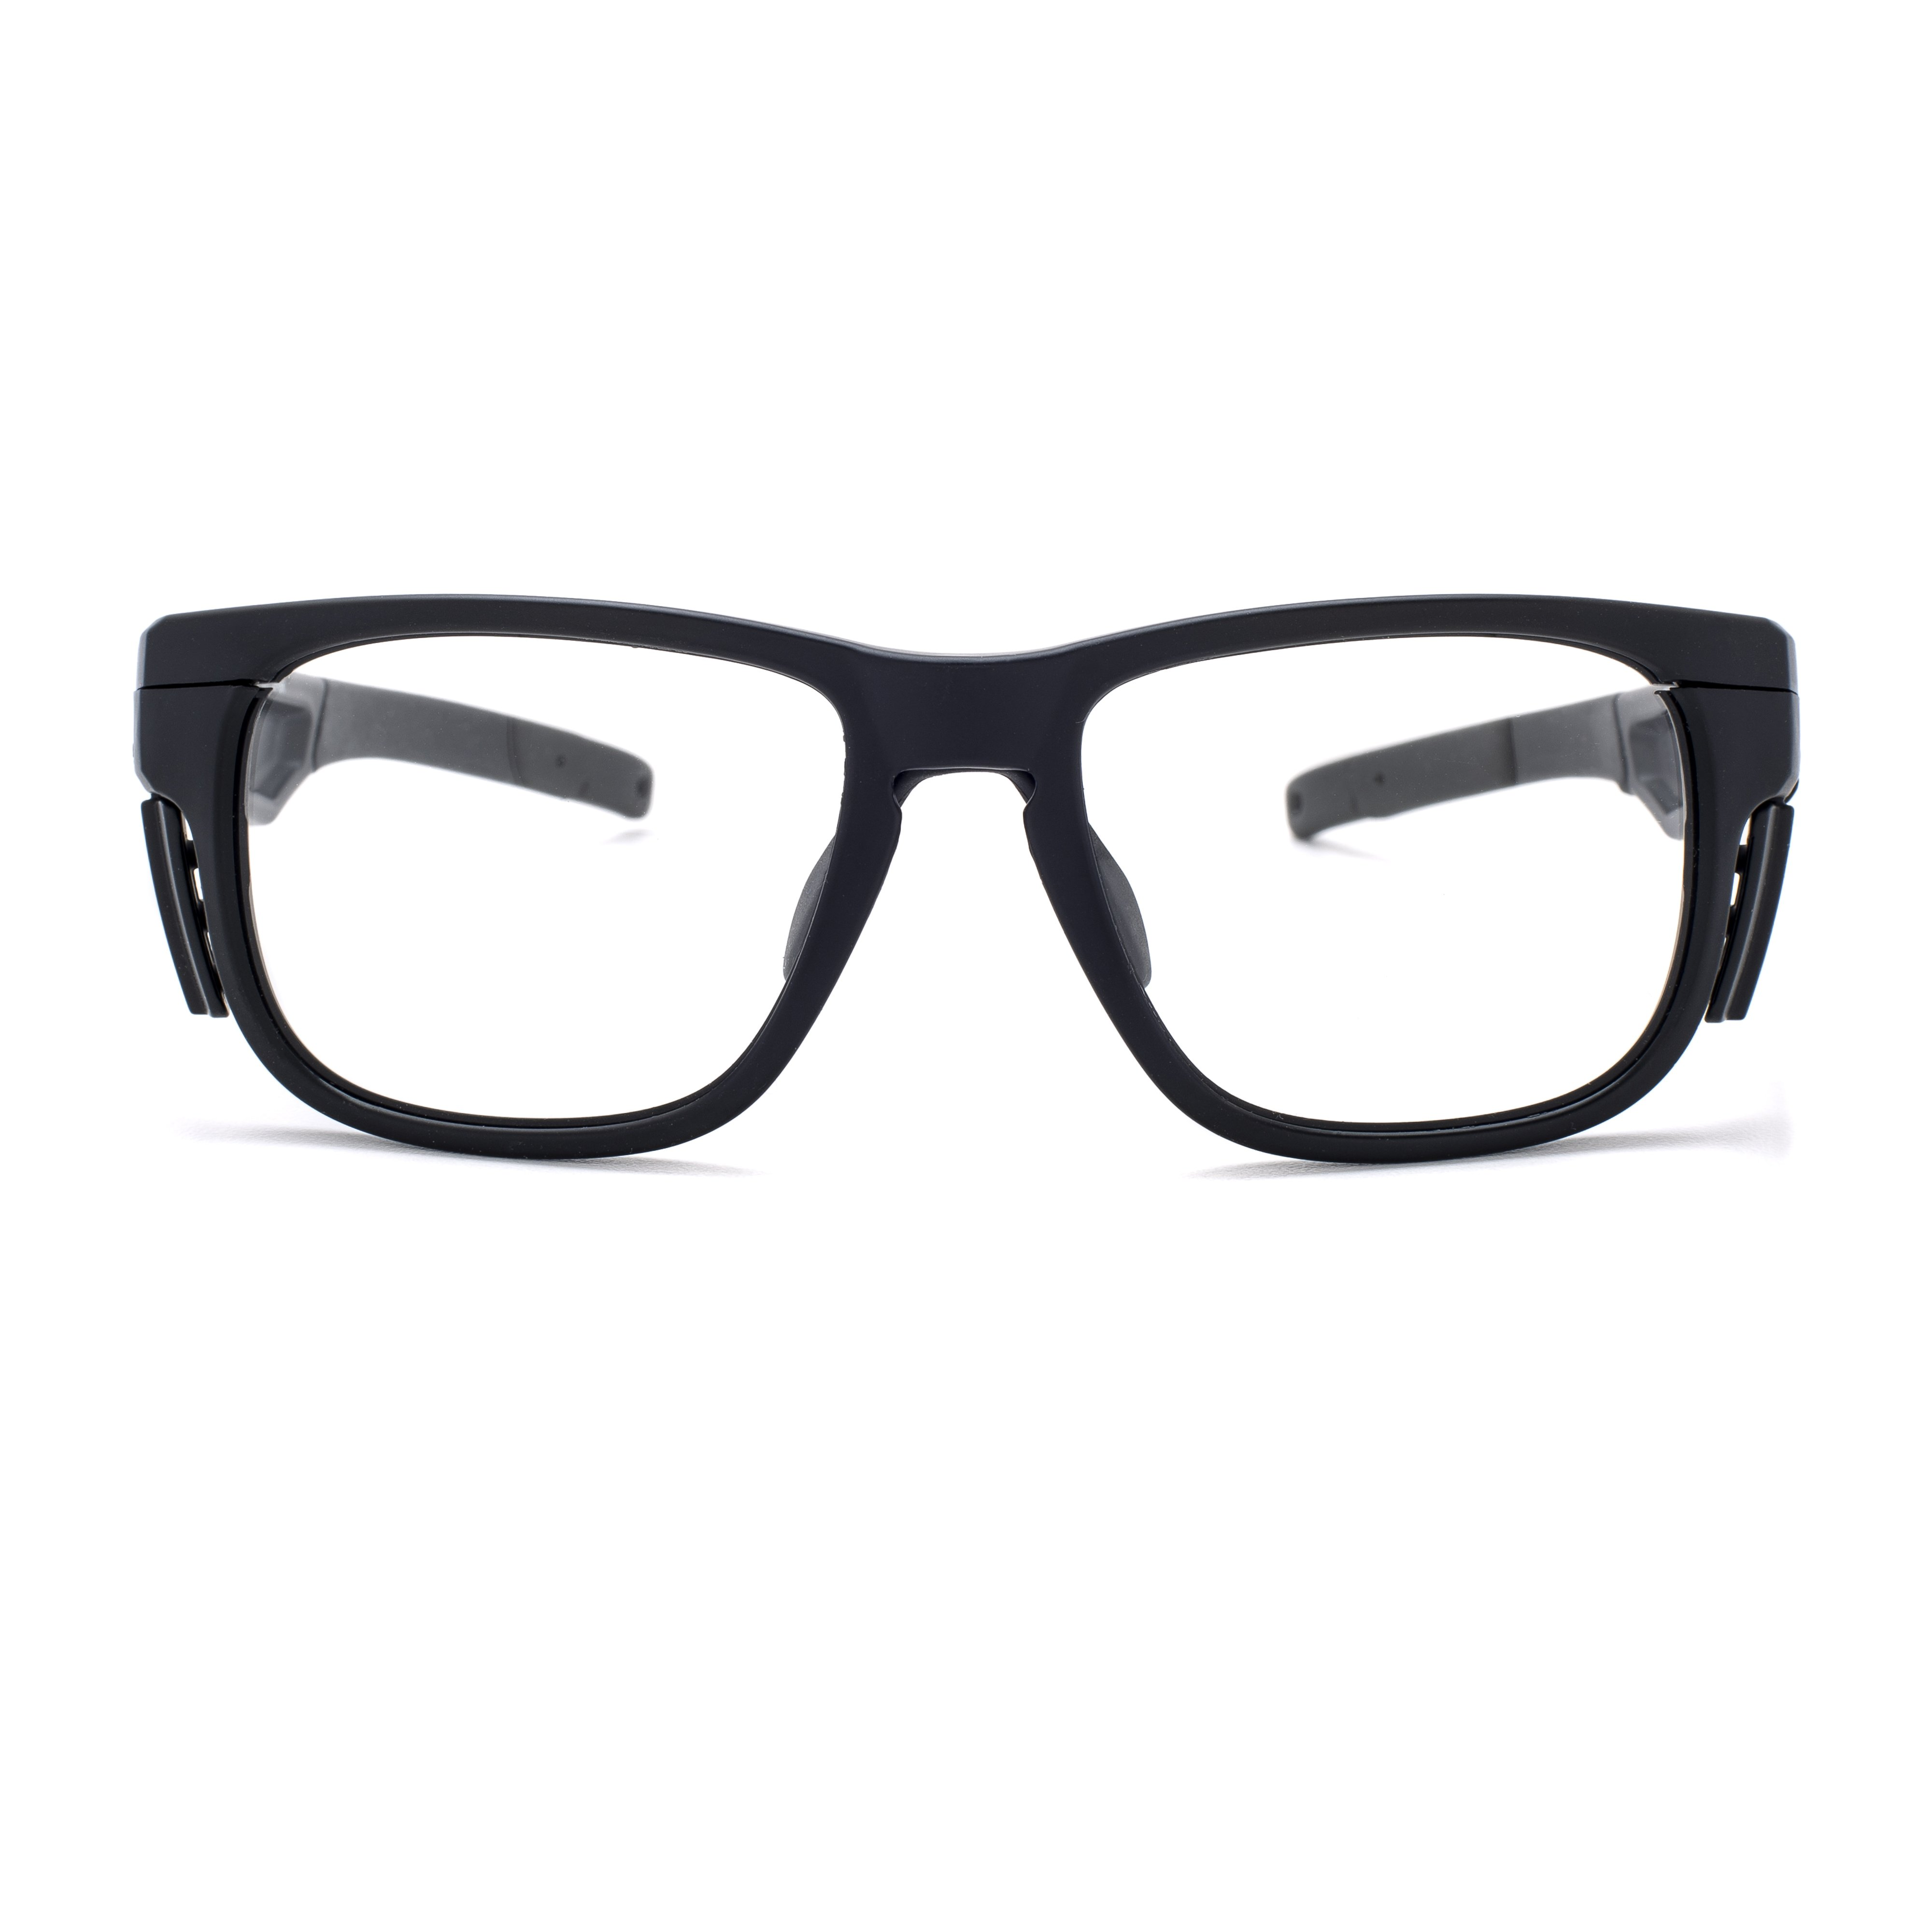 62420705be44 Prescription Safety Glasses RX-F126 - Rx Prescription Safety Glasses